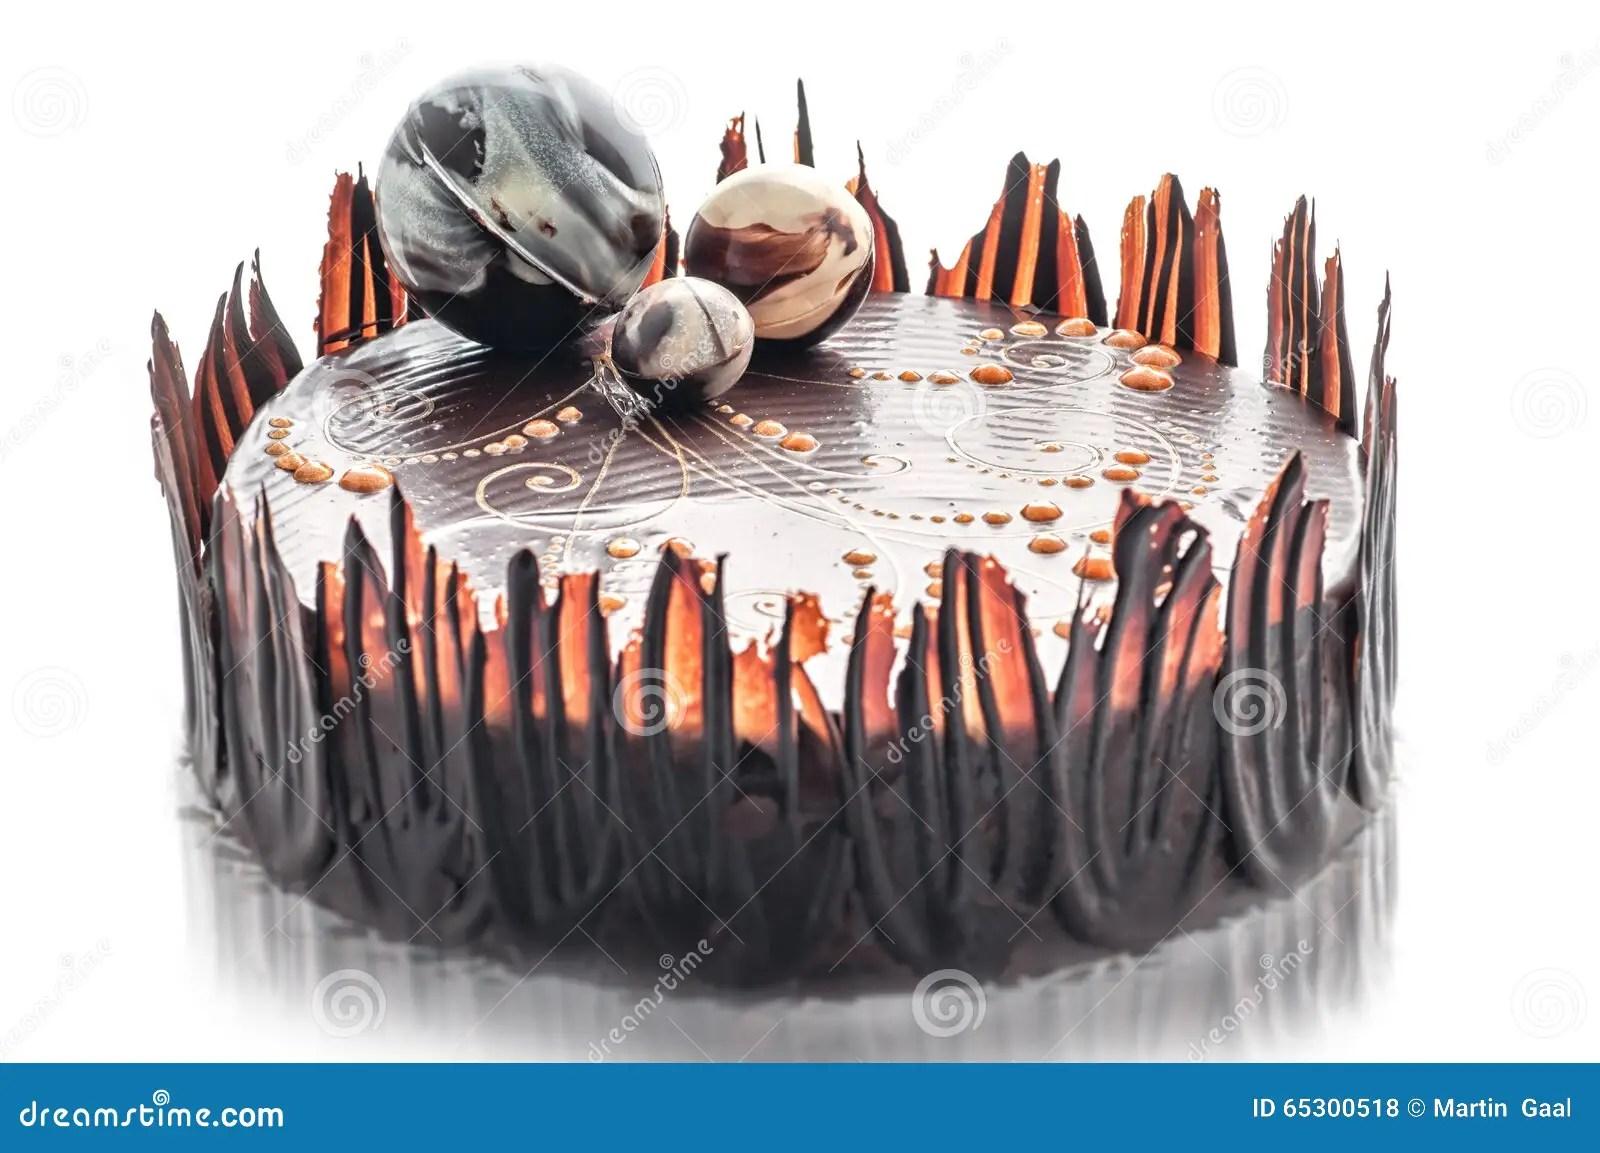 Patisserie Cake Shop